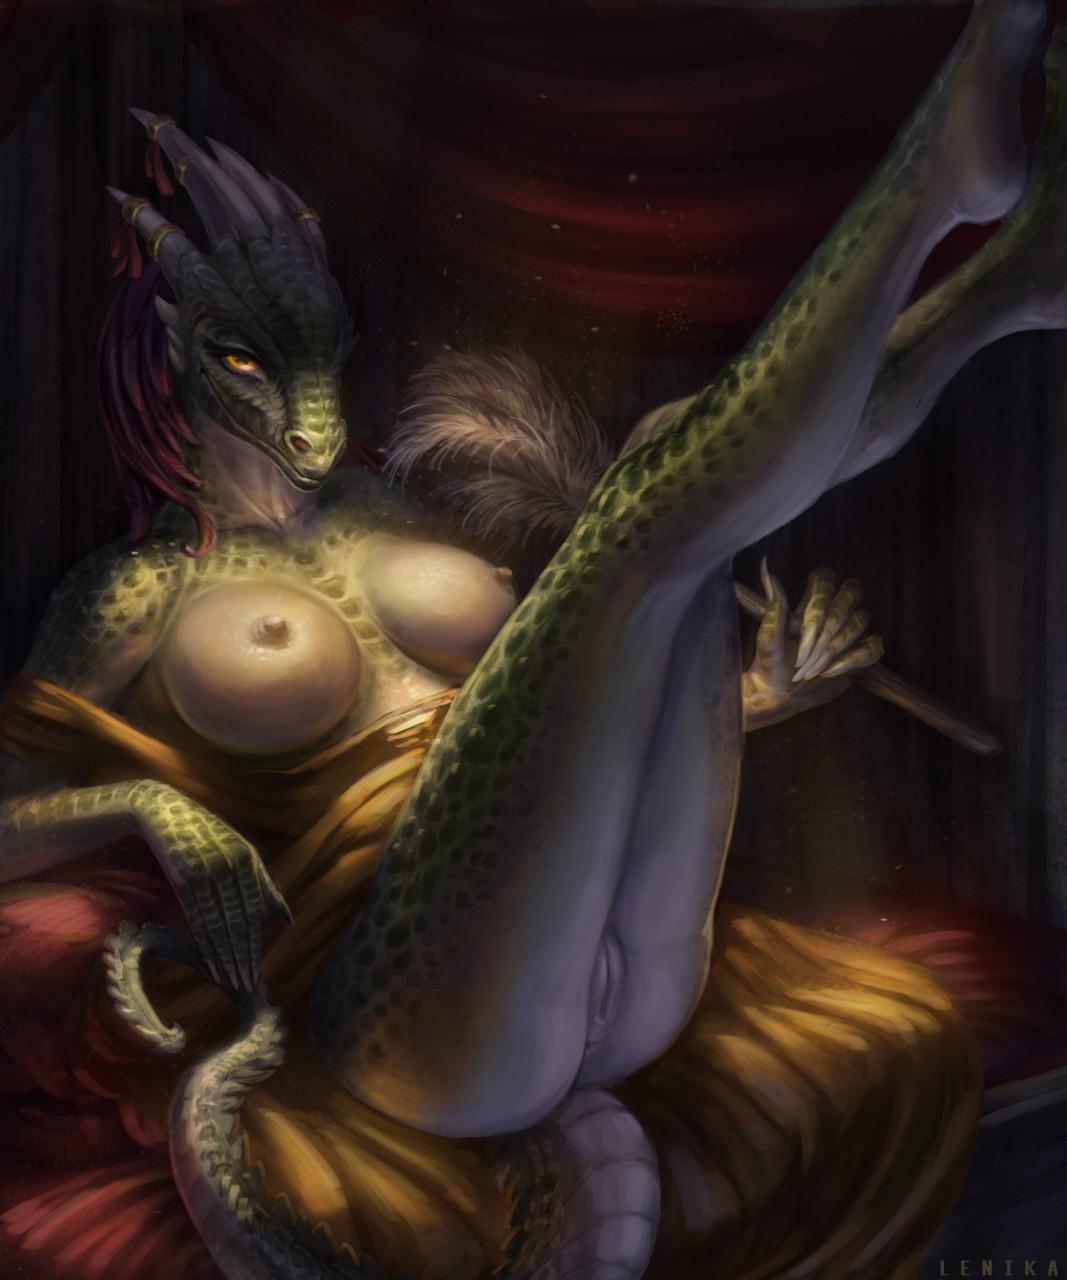 the lusty skyrim locations maid argonian Joshiochi!: 2-kai kara onnanoko ga... futtekita